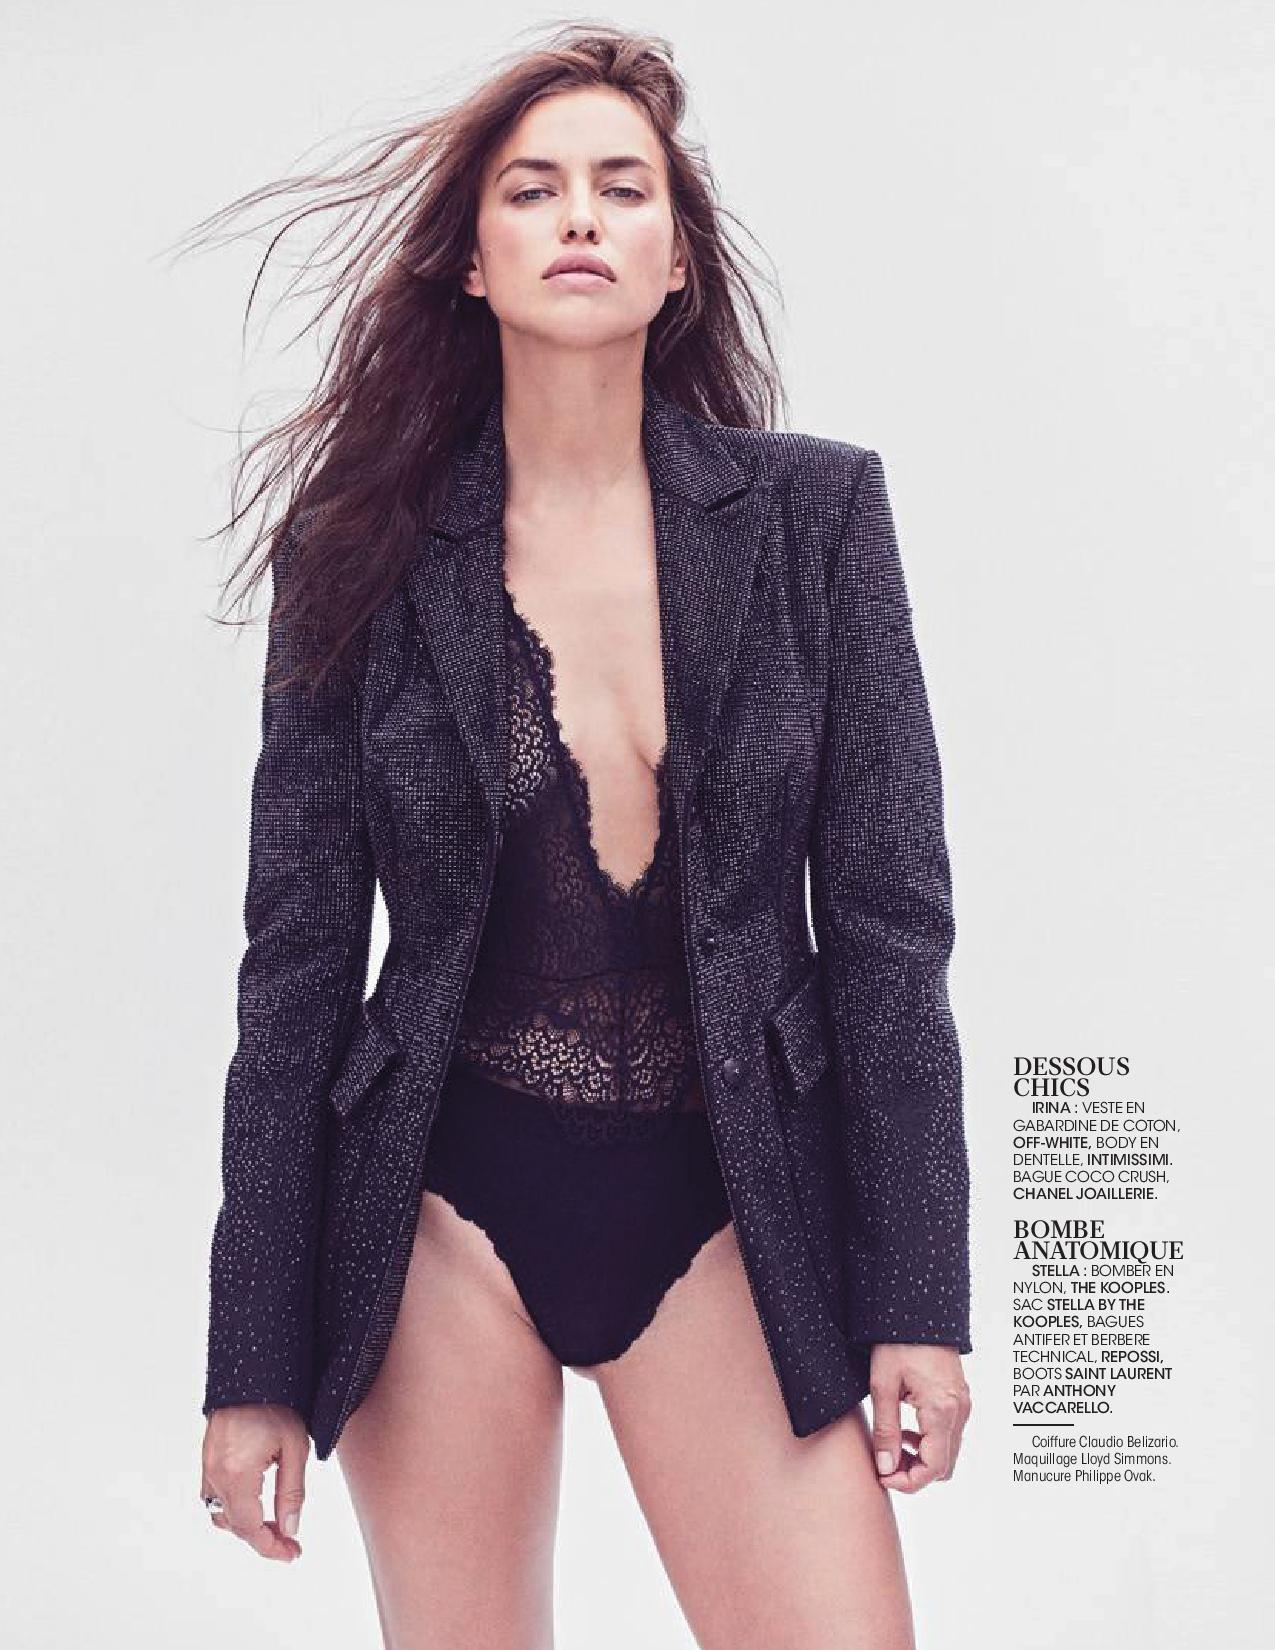 Irina Shayk + Stella Maxwell by Matthew Brookes for Madame Figaro Nov 2018 (5).jpg